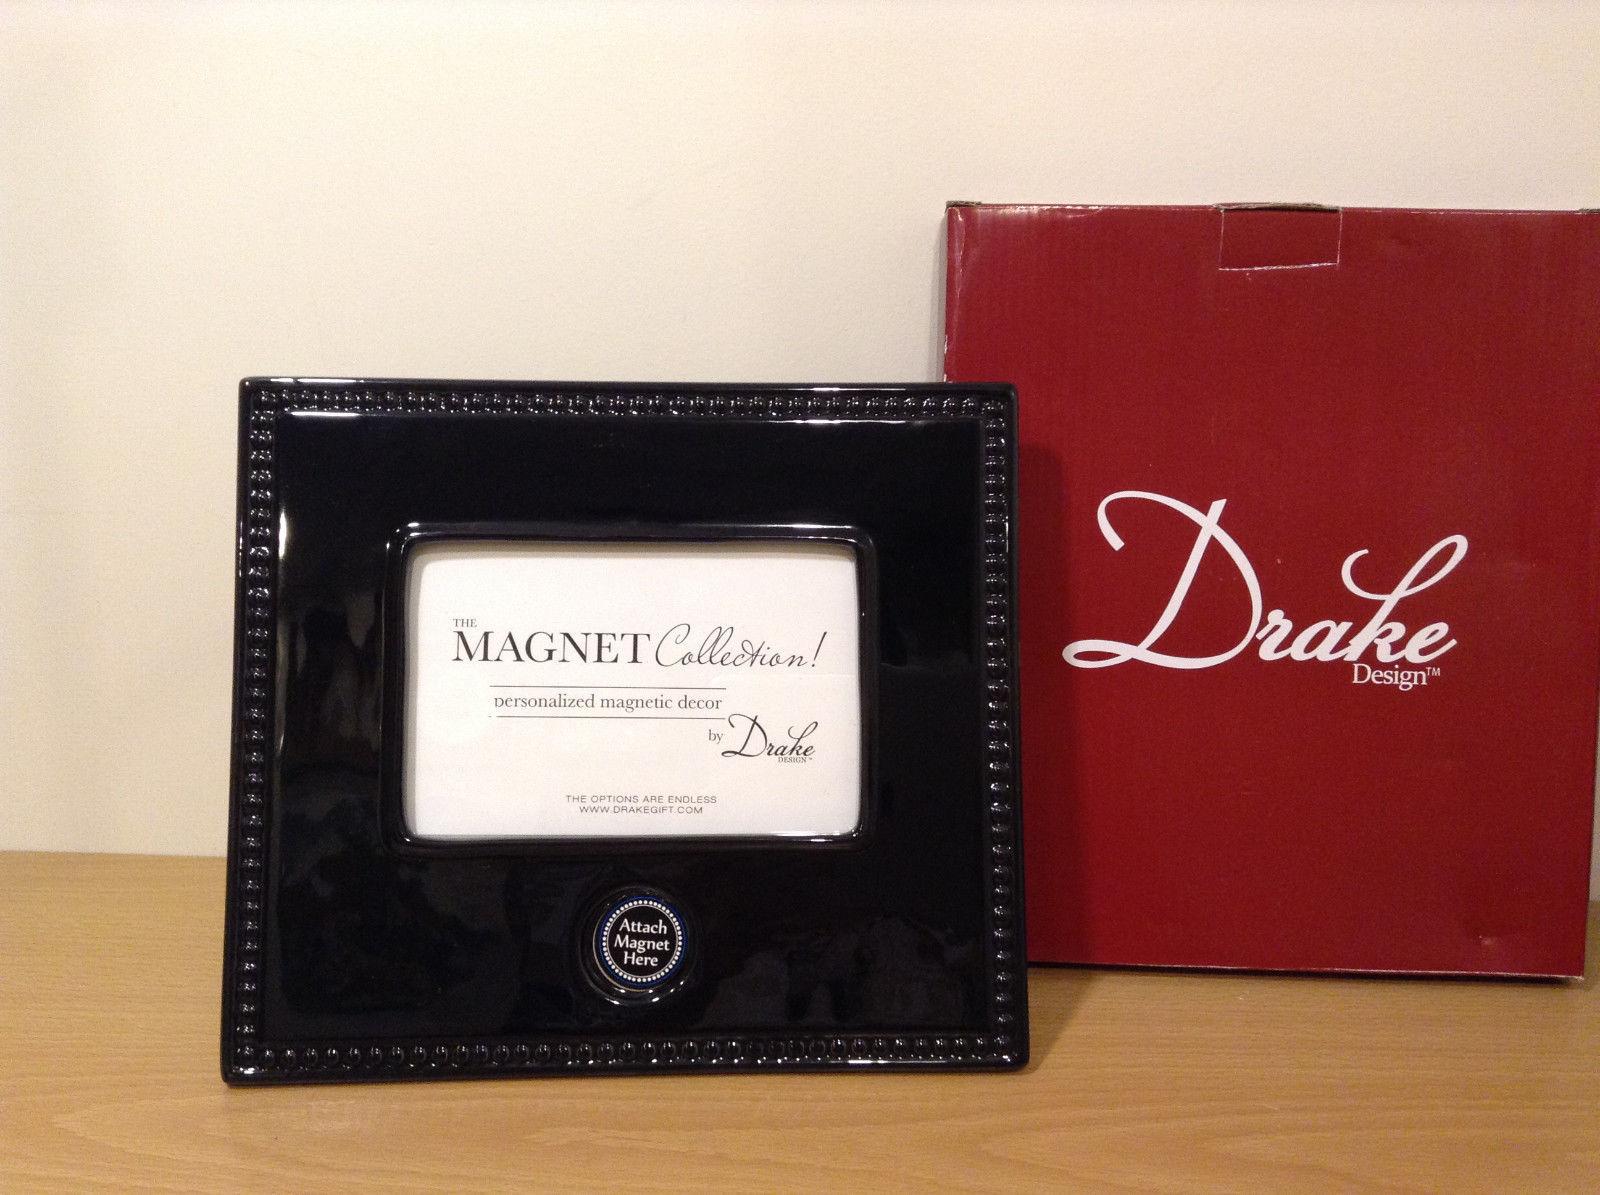 Black Ceramic Photo Frame with Magnetic spot for magnet by Drake design, New